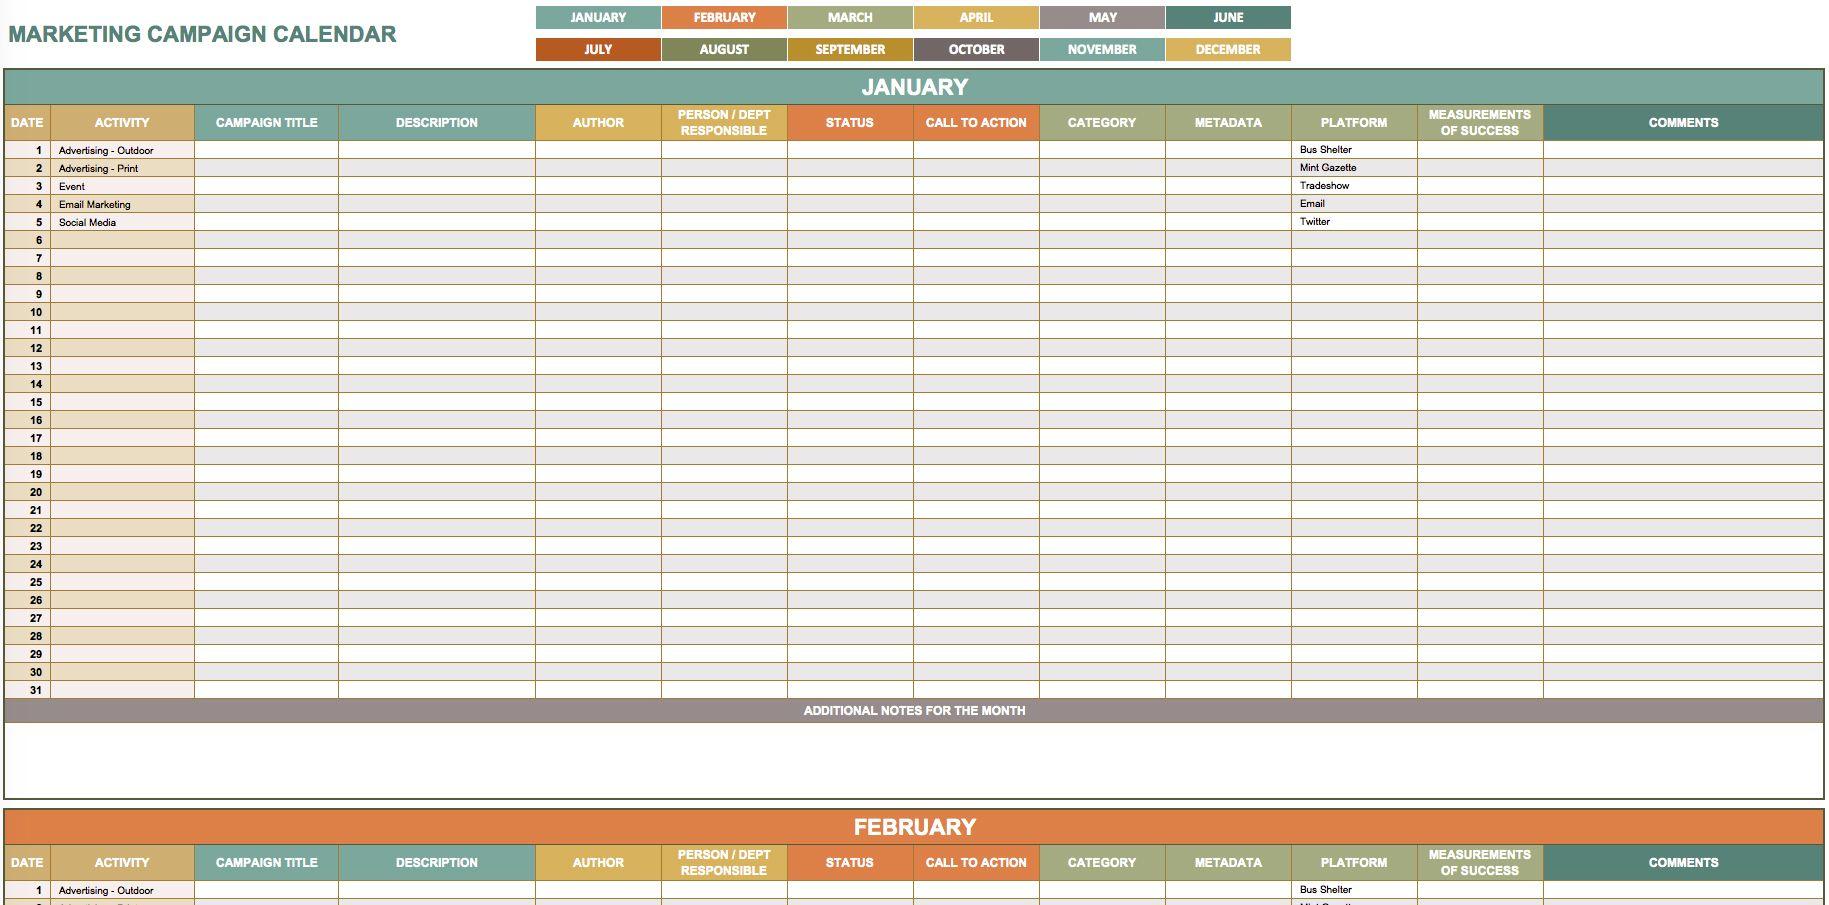 Free Marketing Calendar Templates In Google, Excel, And within Google Excel Calendar Template